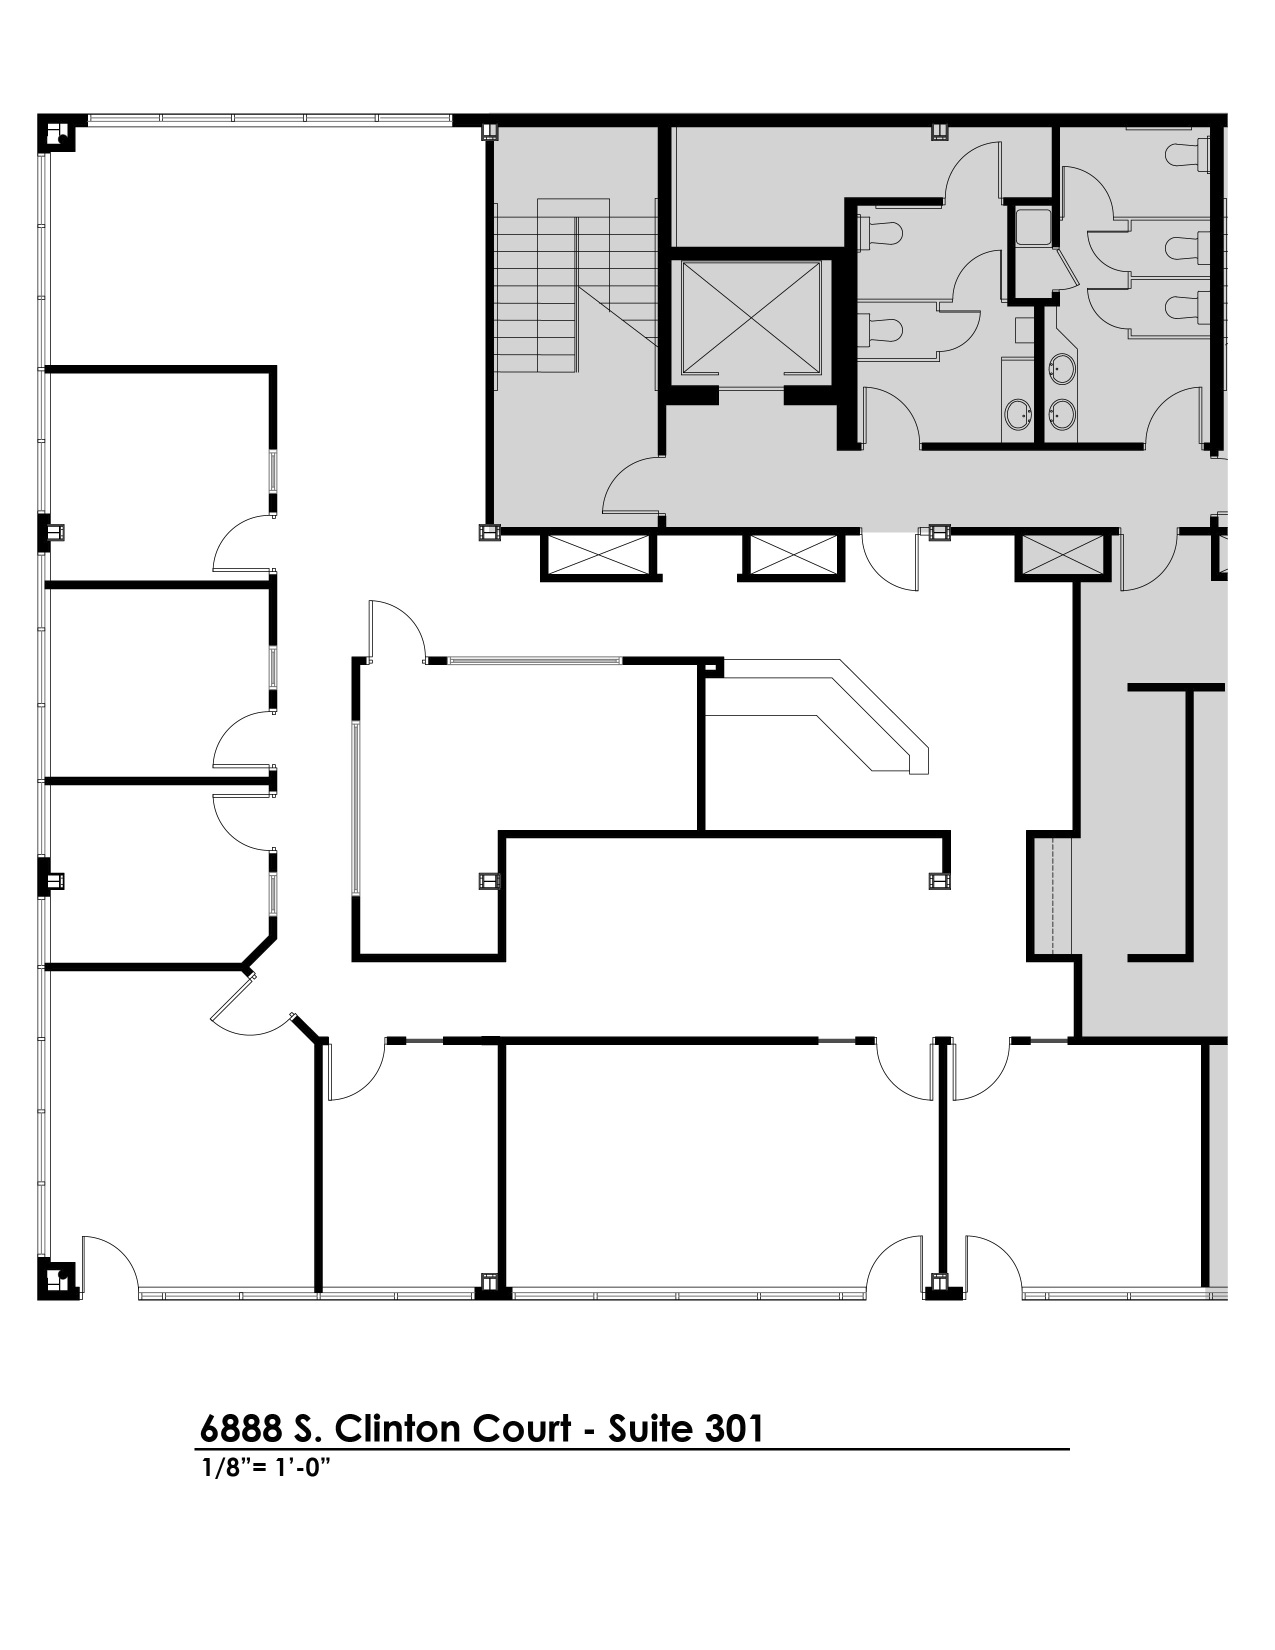 Suite 301 Floorplan